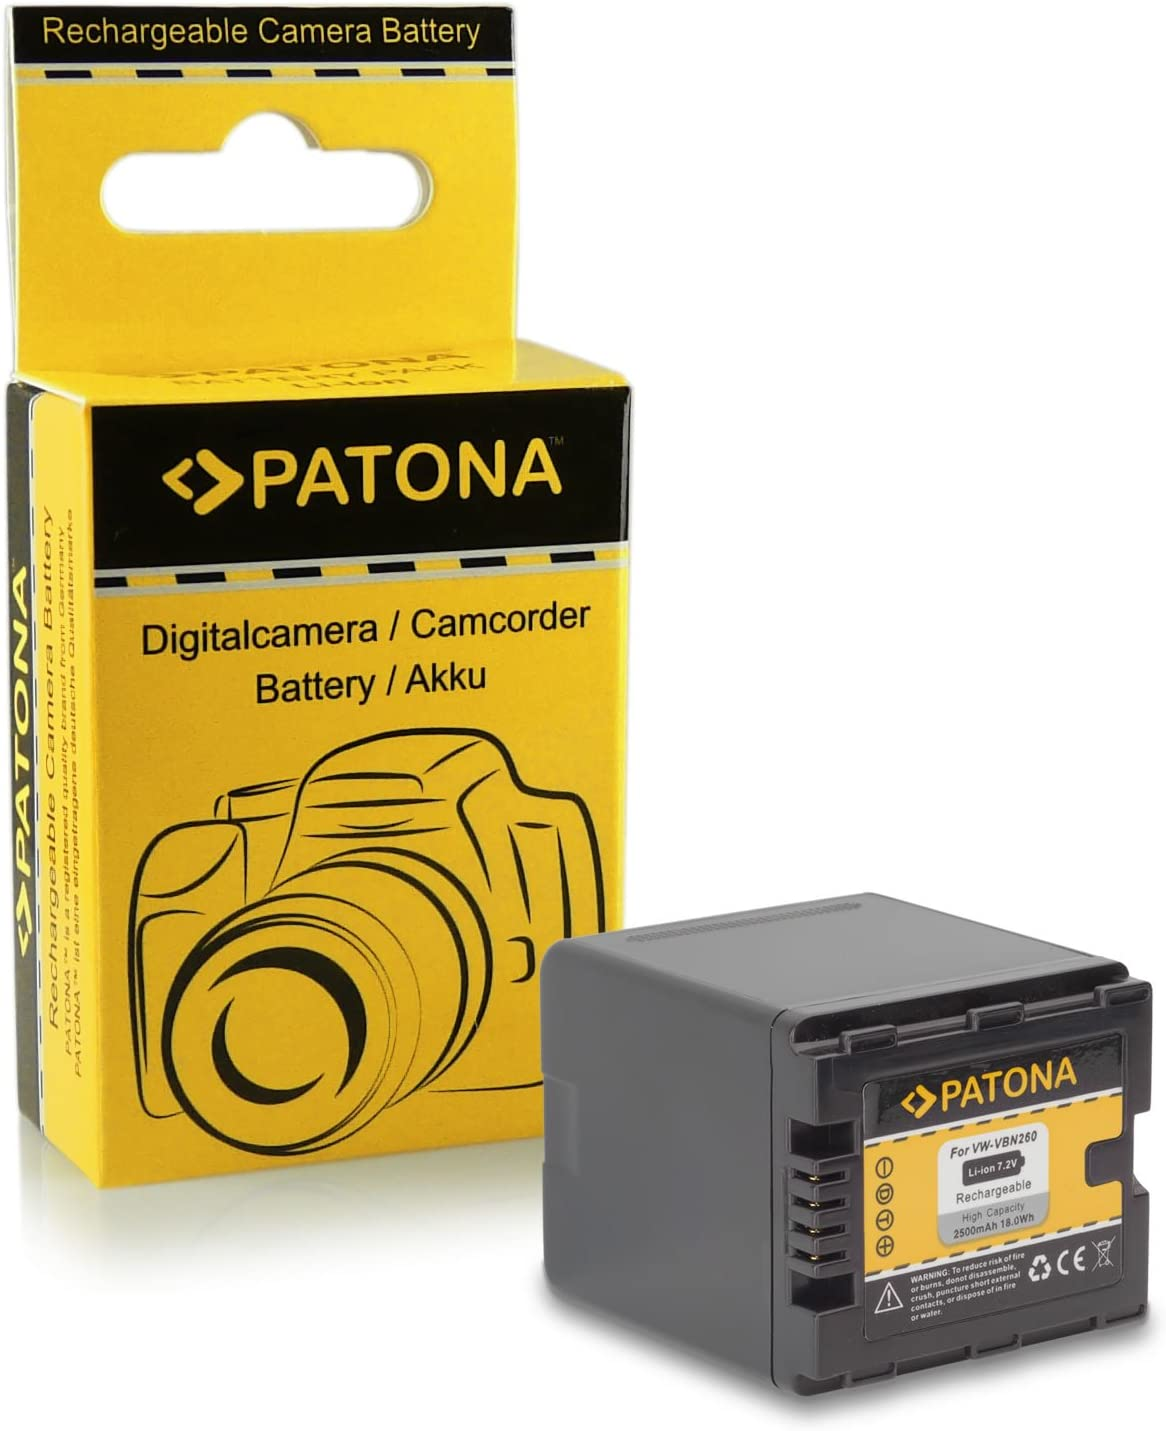 hc-x810 CARGADOR set para Panasonic hc-x909 Batería hc-x929 vbn260 hc-x800